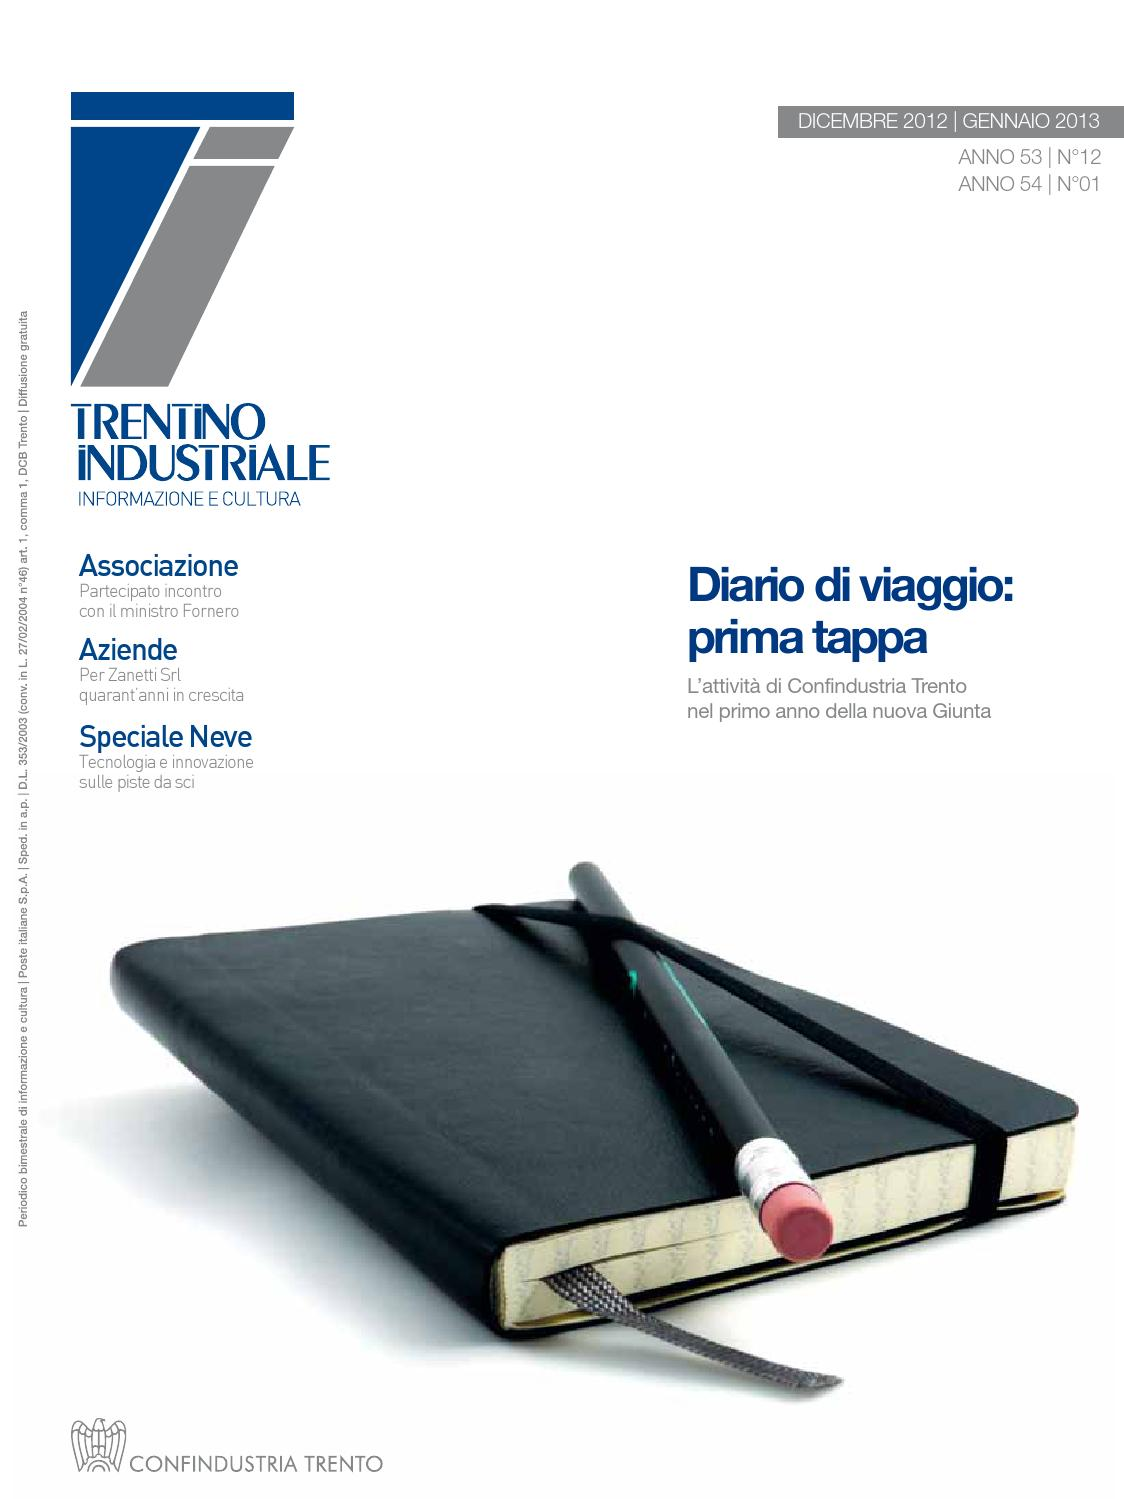 091ee2d776 Trentino Industriale | dicembre - gennaio 2013 by Confindustria Trento -  issuu